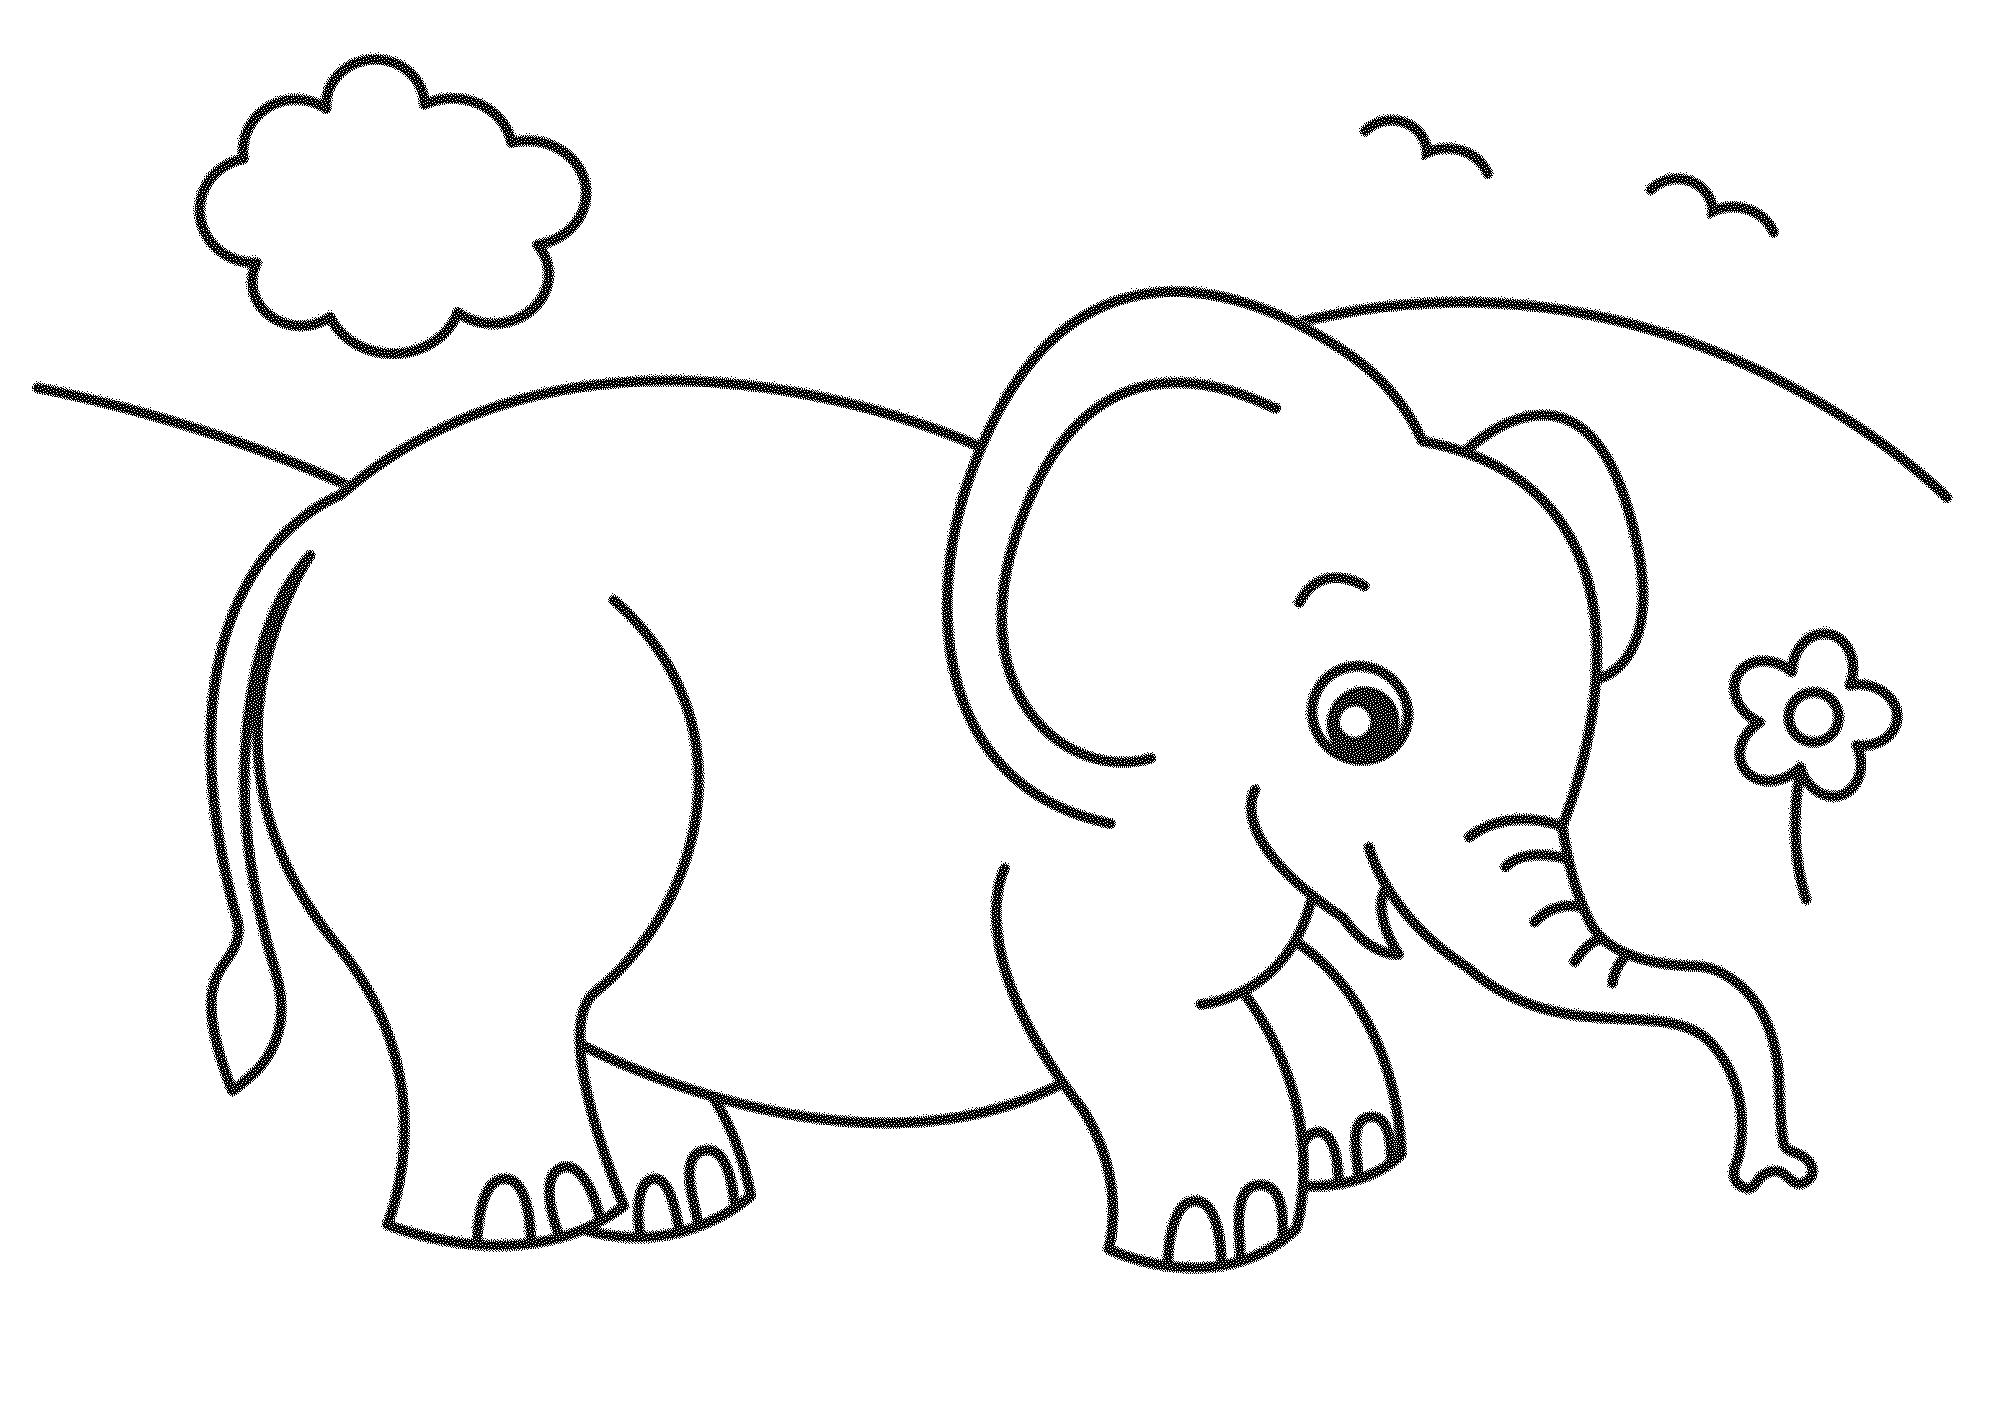 elephant images for colouring free elephant coloring pages images elephant colouring for